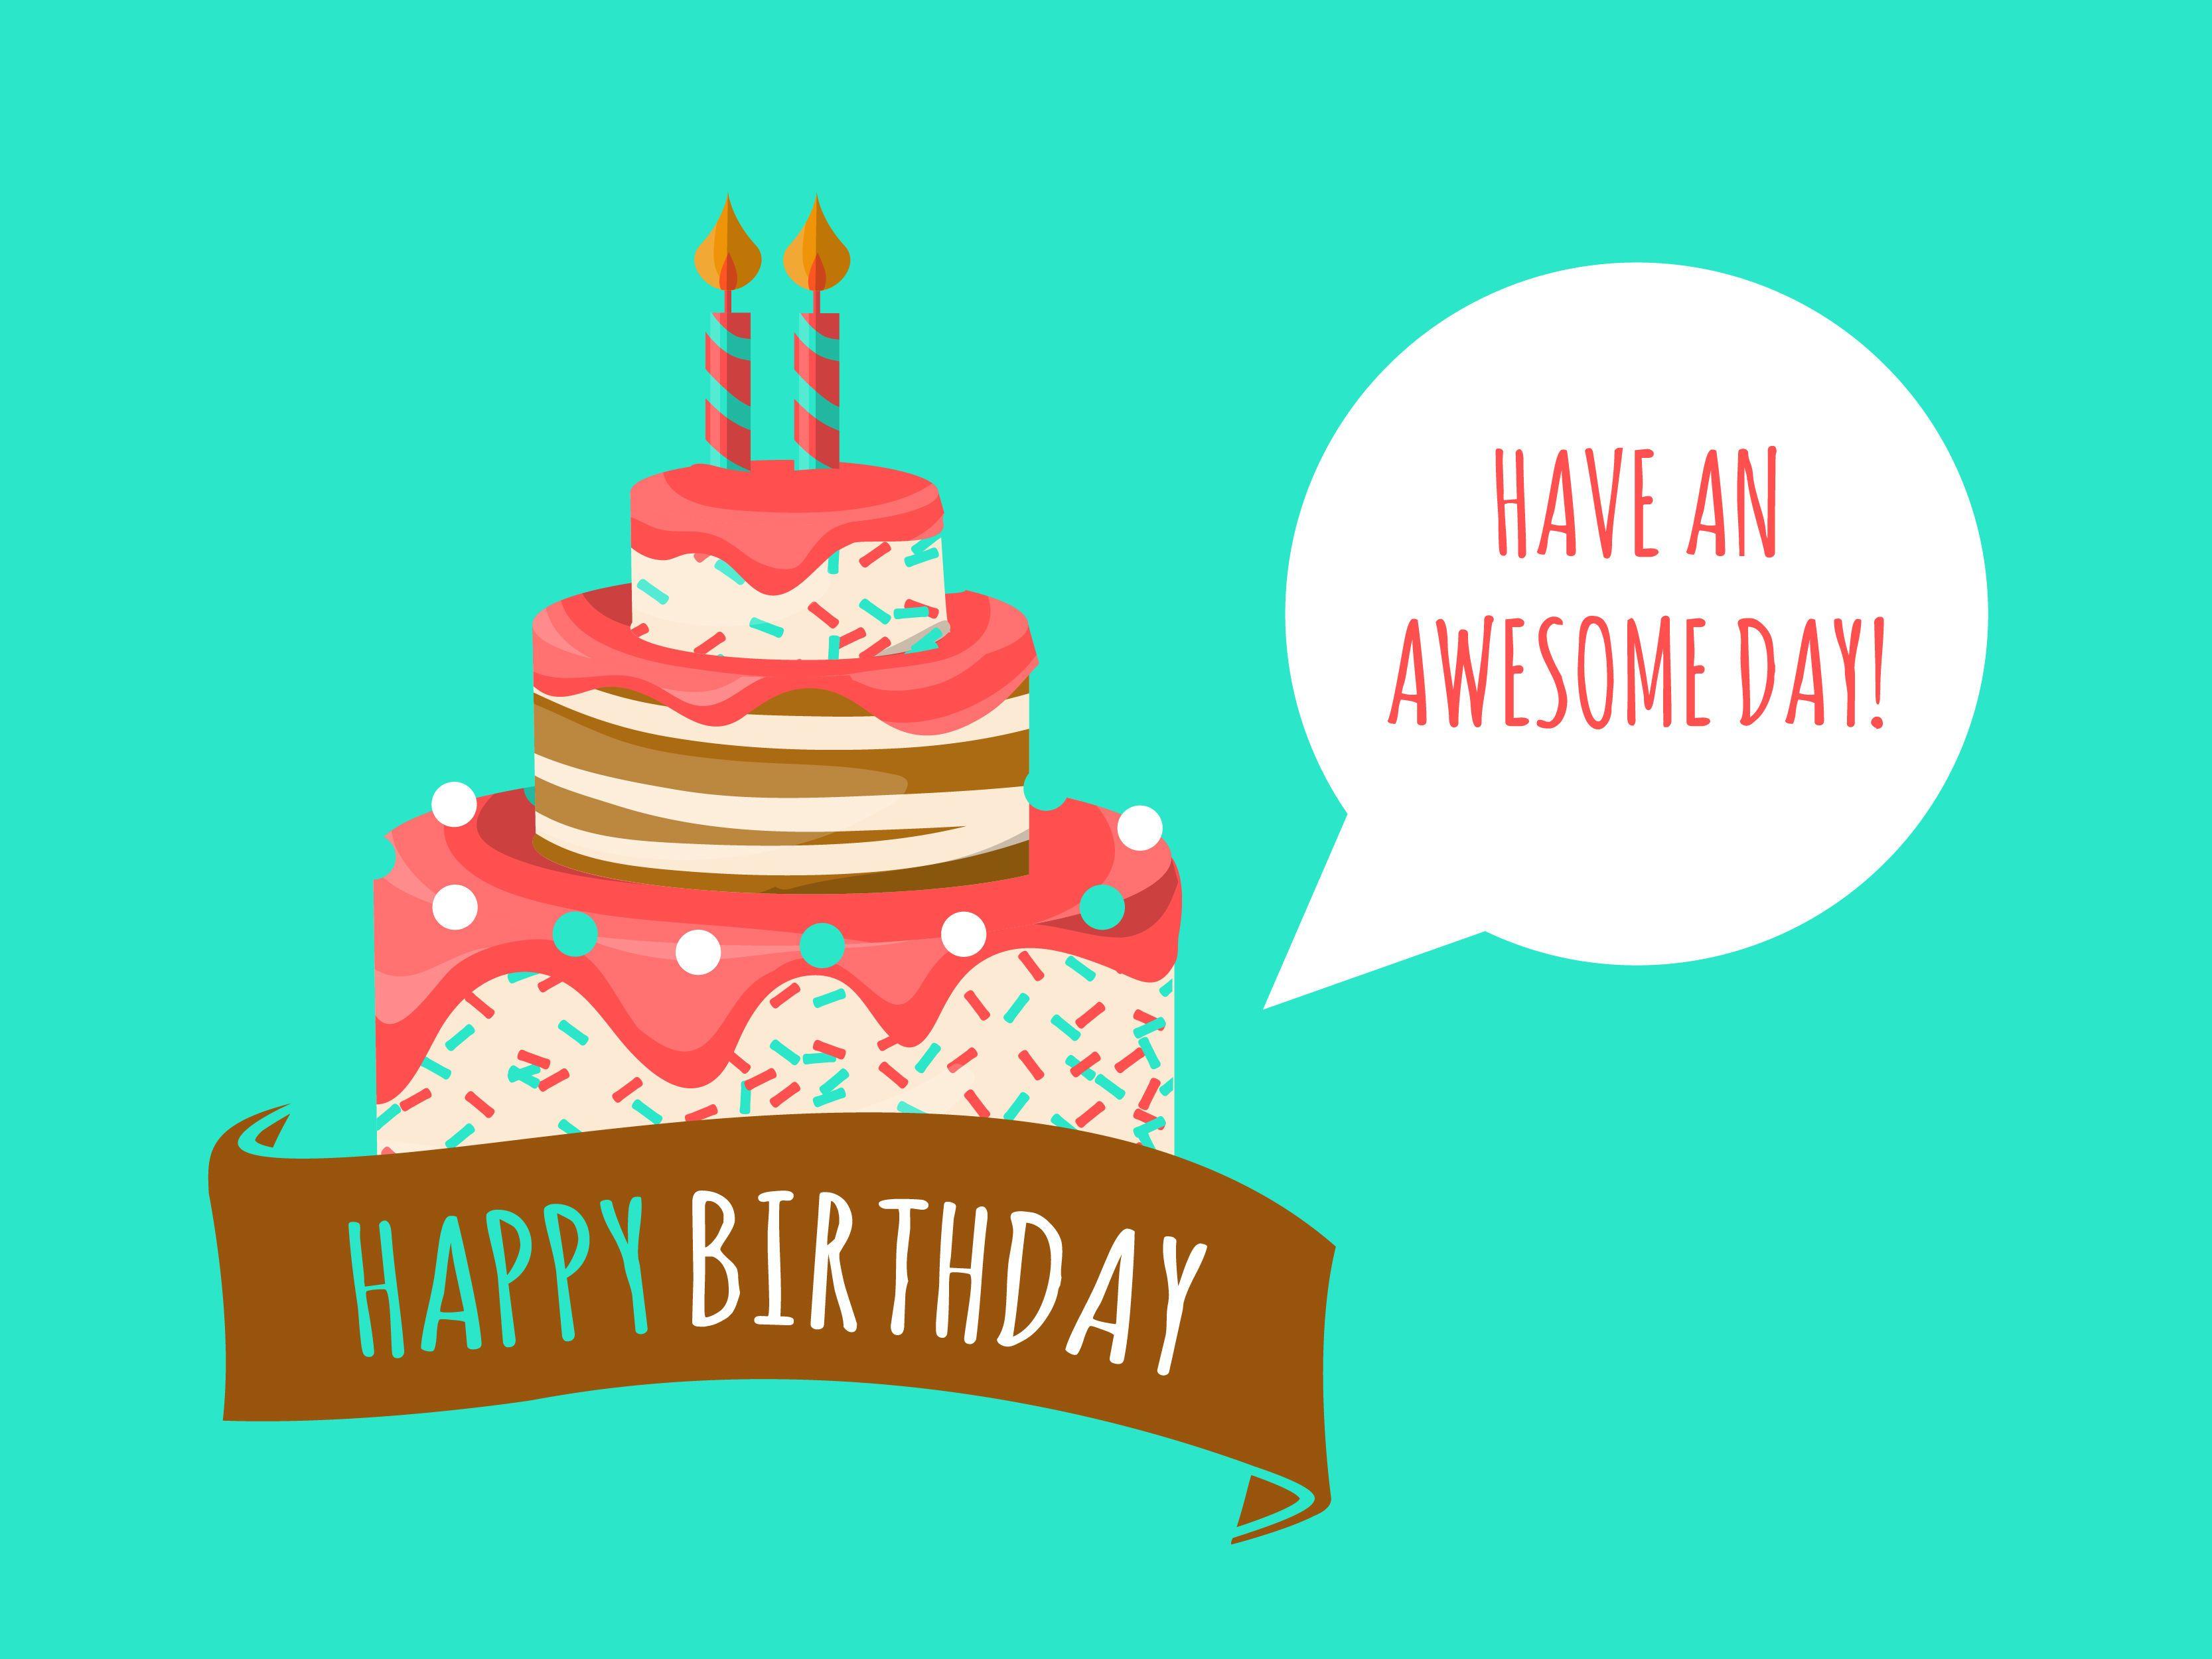 Birthday card with cake illustration